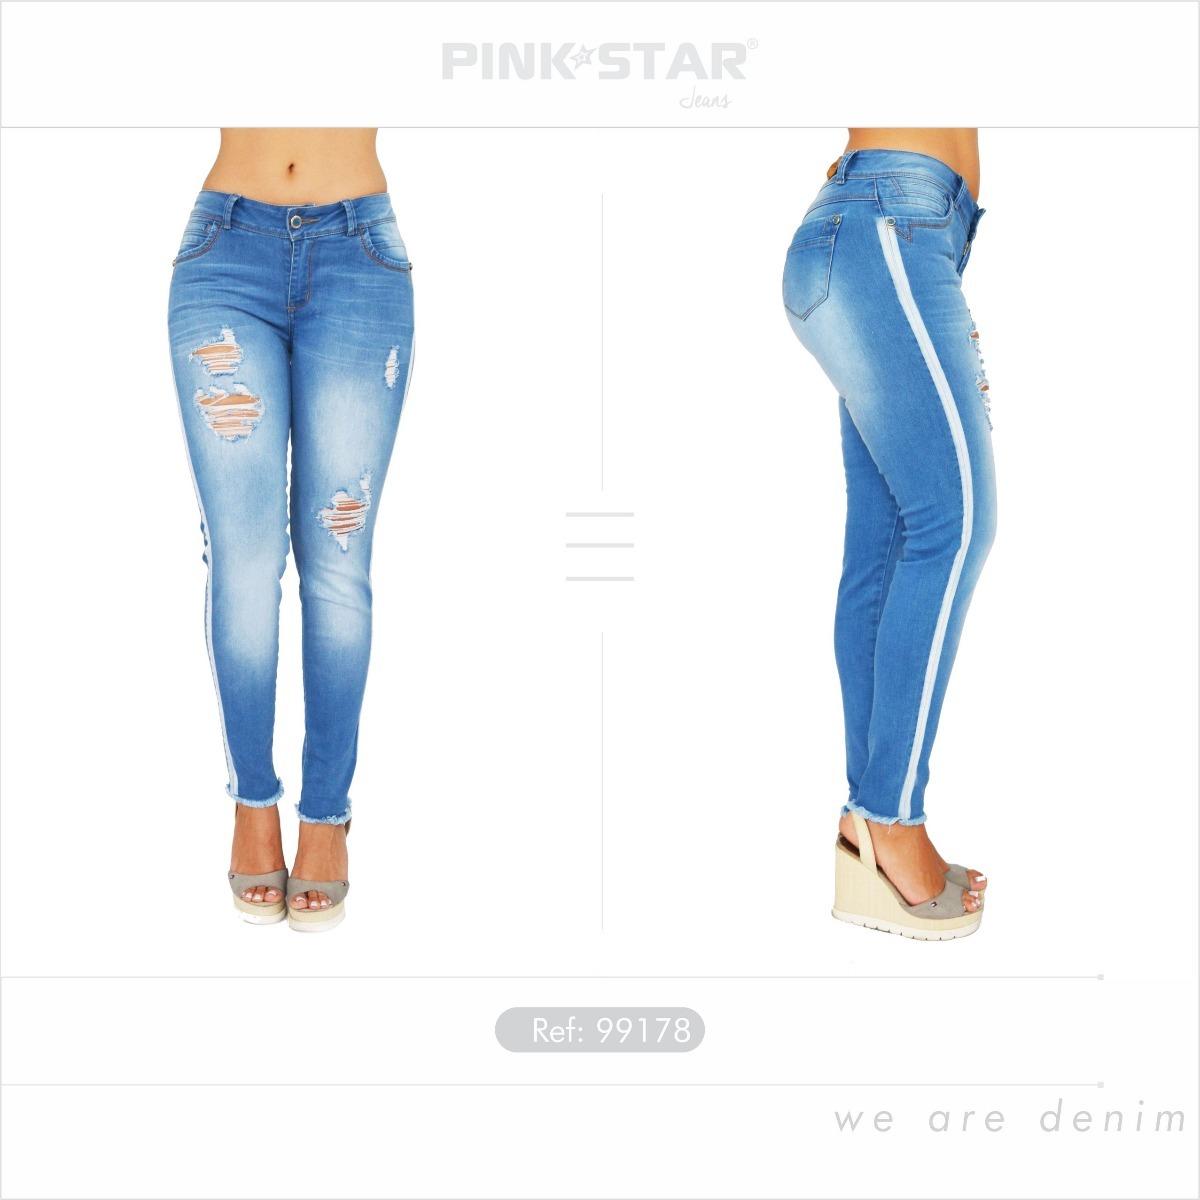 jeans dama levantacola - pink star jeans - jeans de moda. Cargando zoom. 867e687ecbab